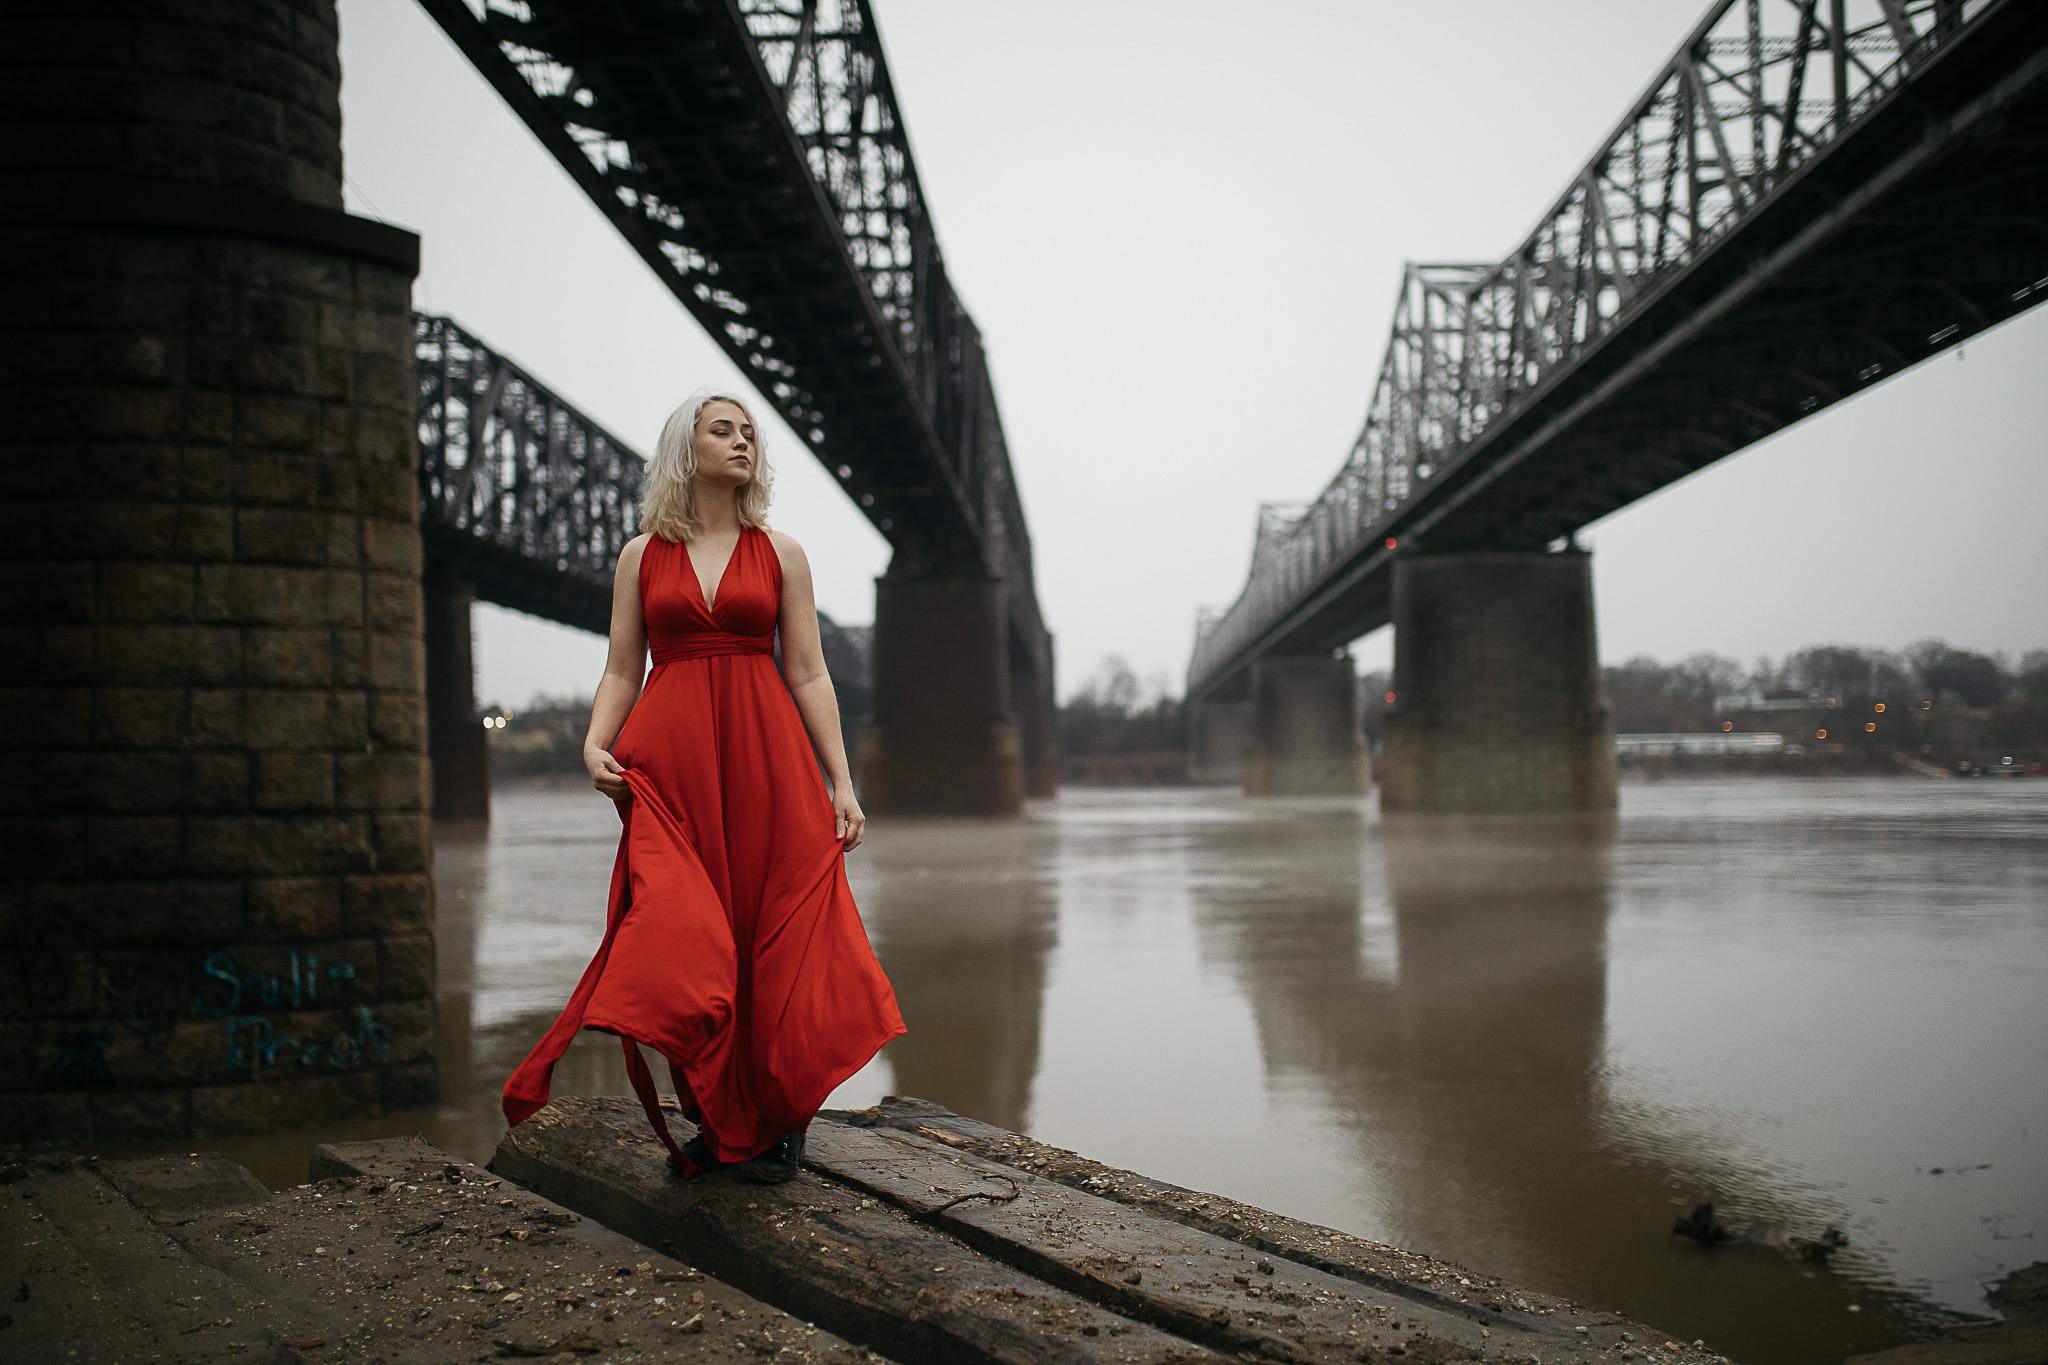 Hosanna-Memphis-Bridge-Red-Dress-Fog-9.jpg